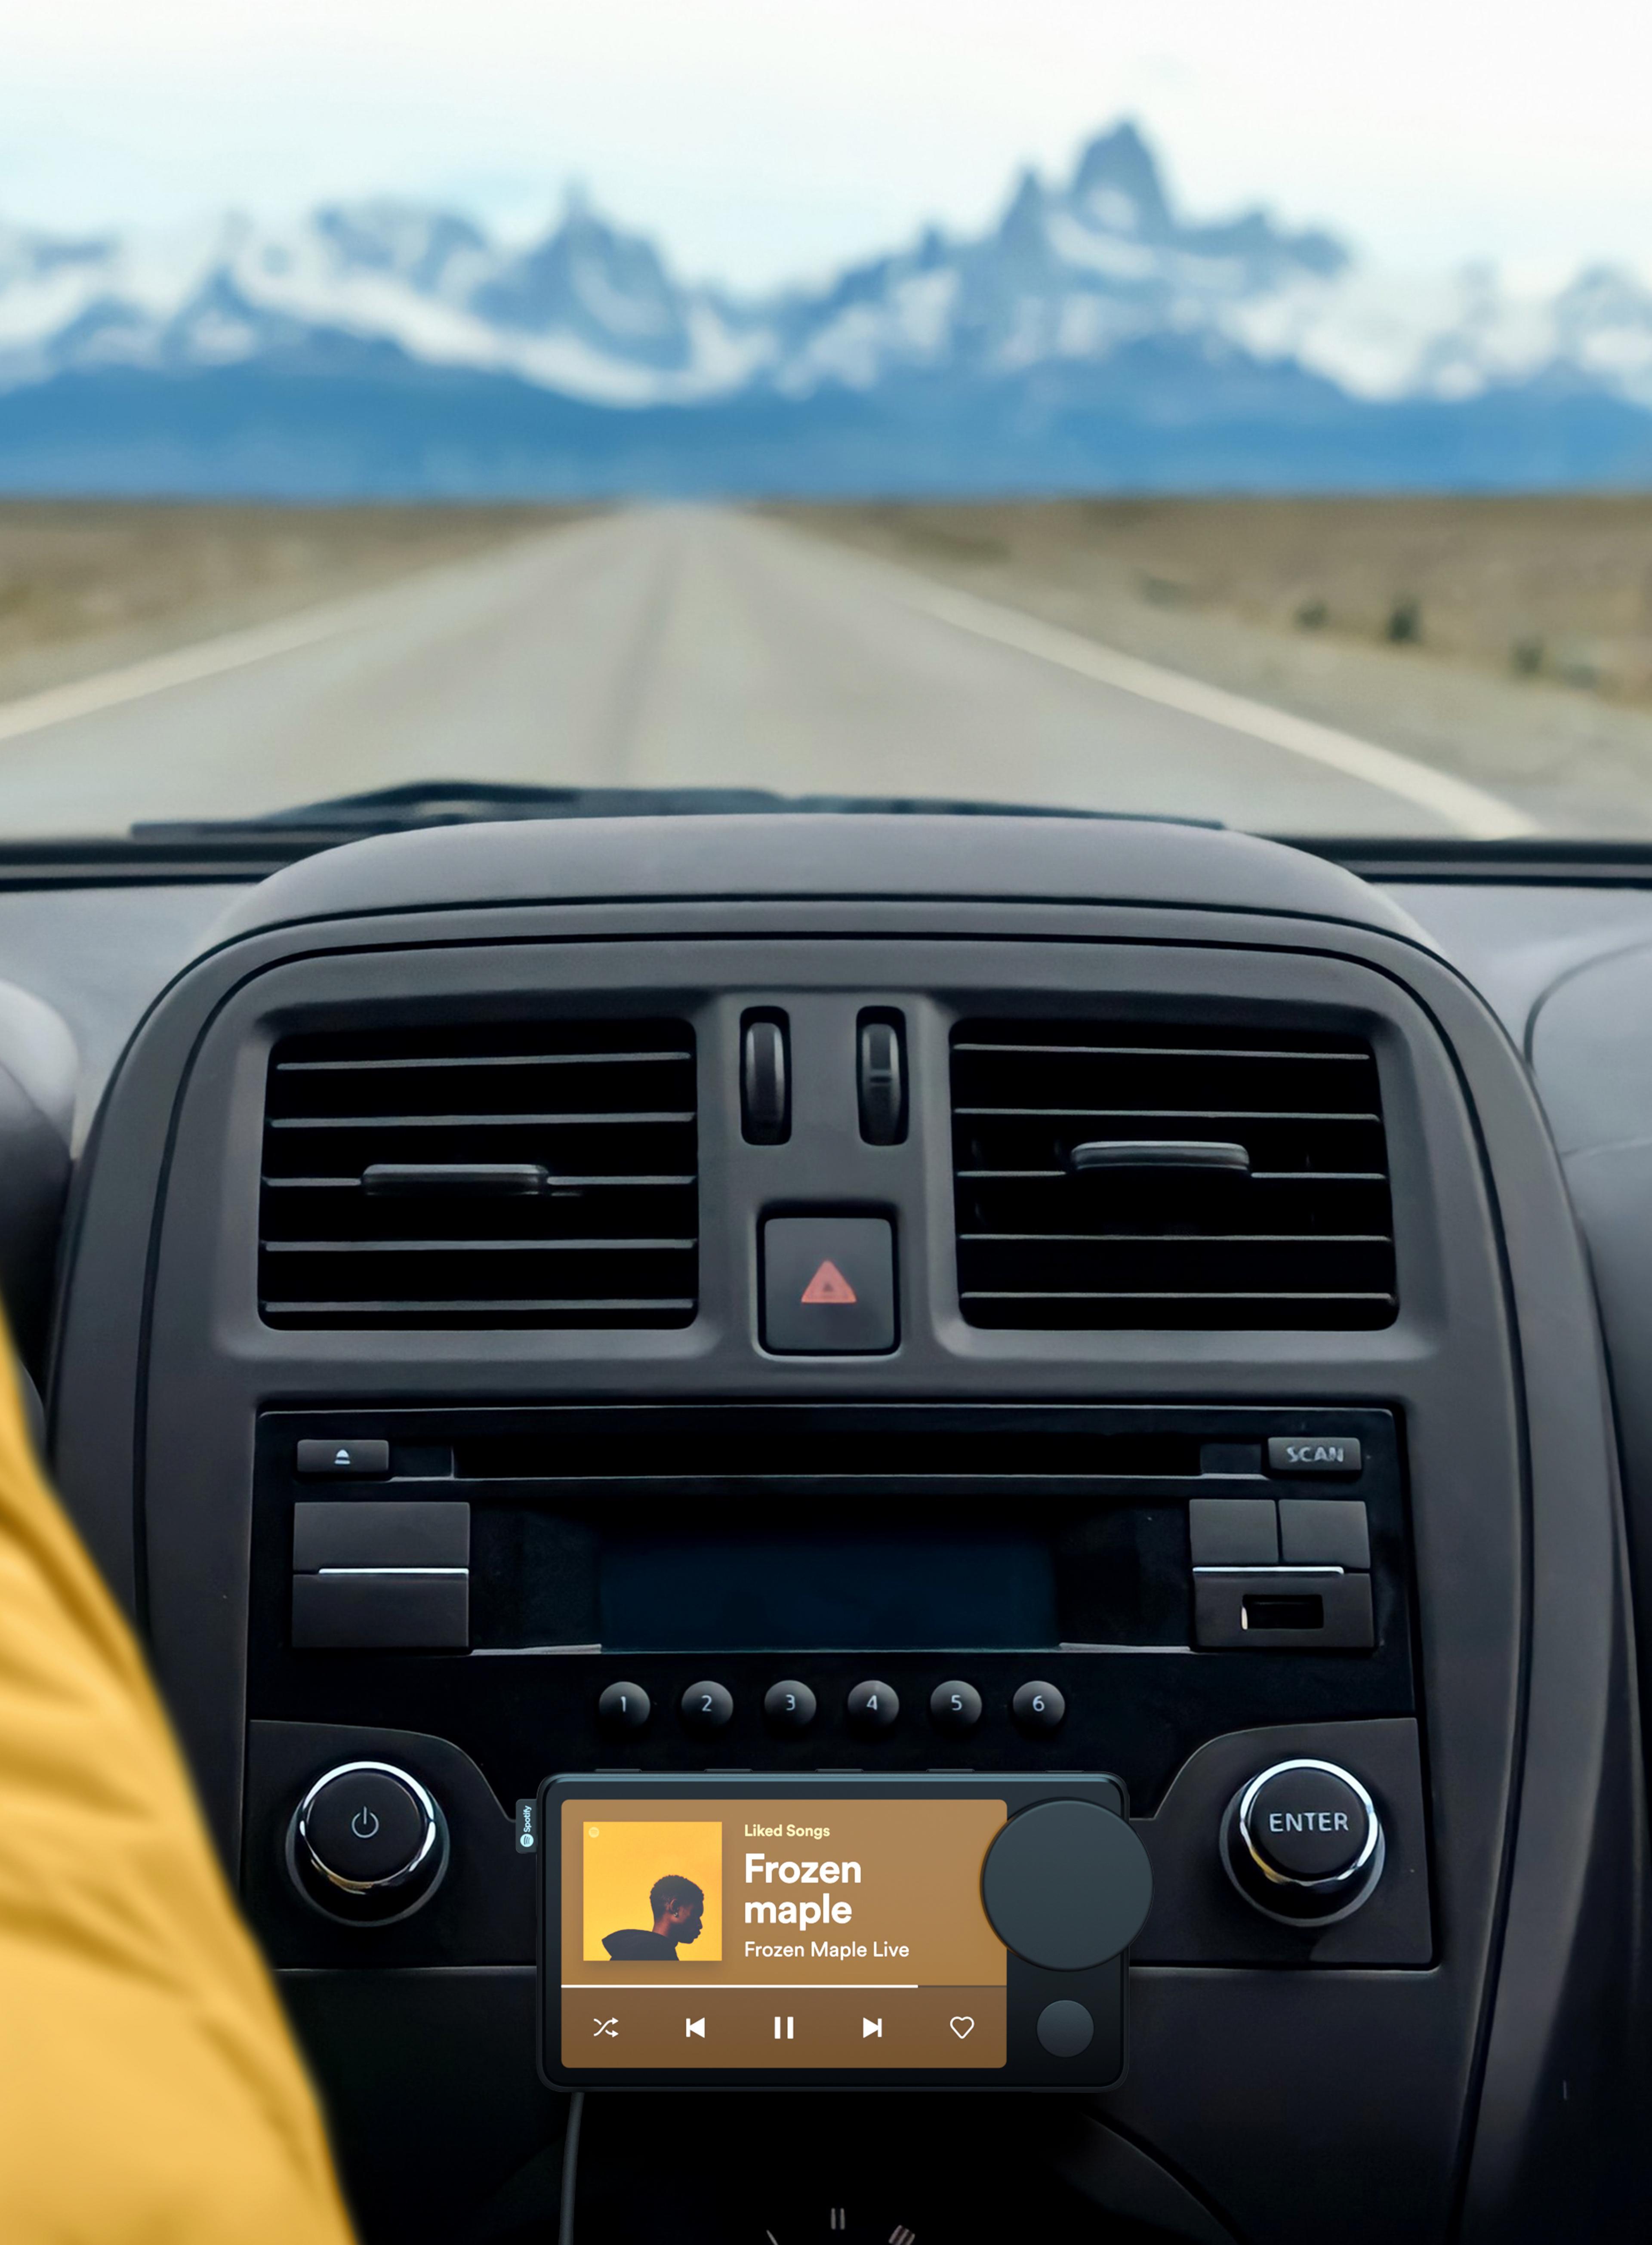 Car Thing mounted on car dashboard